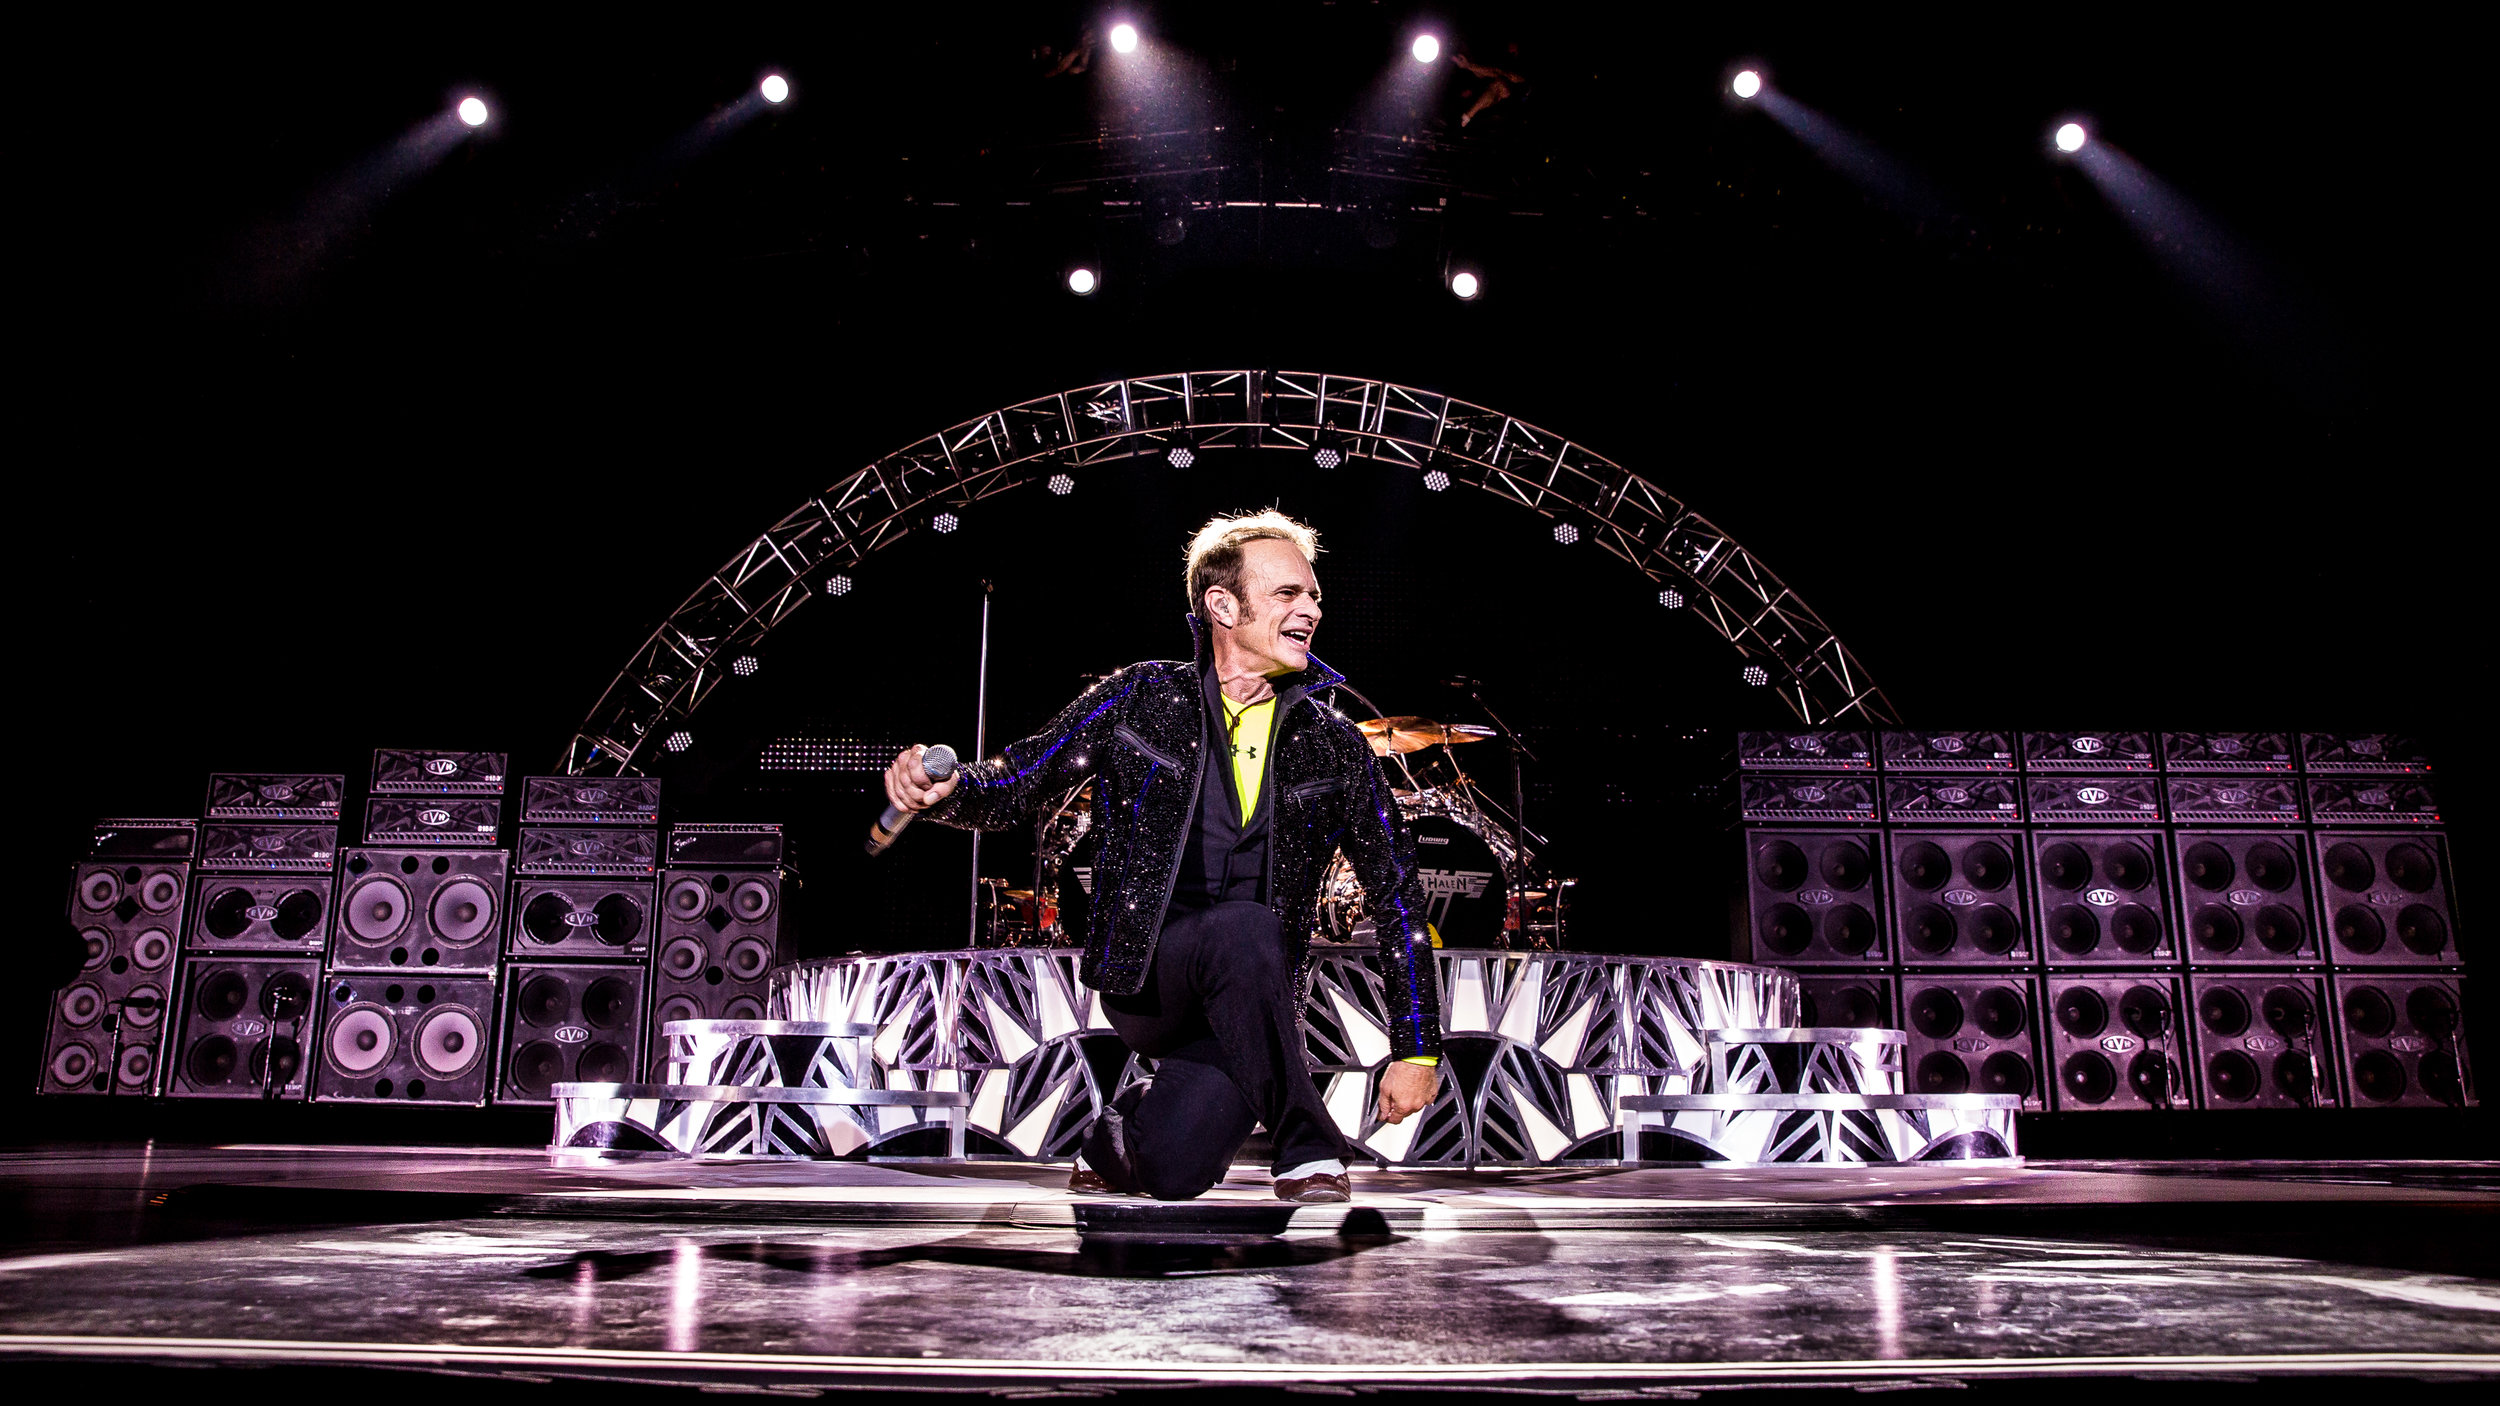 Van Halen [A Different Kind of Truth Tour 2015]